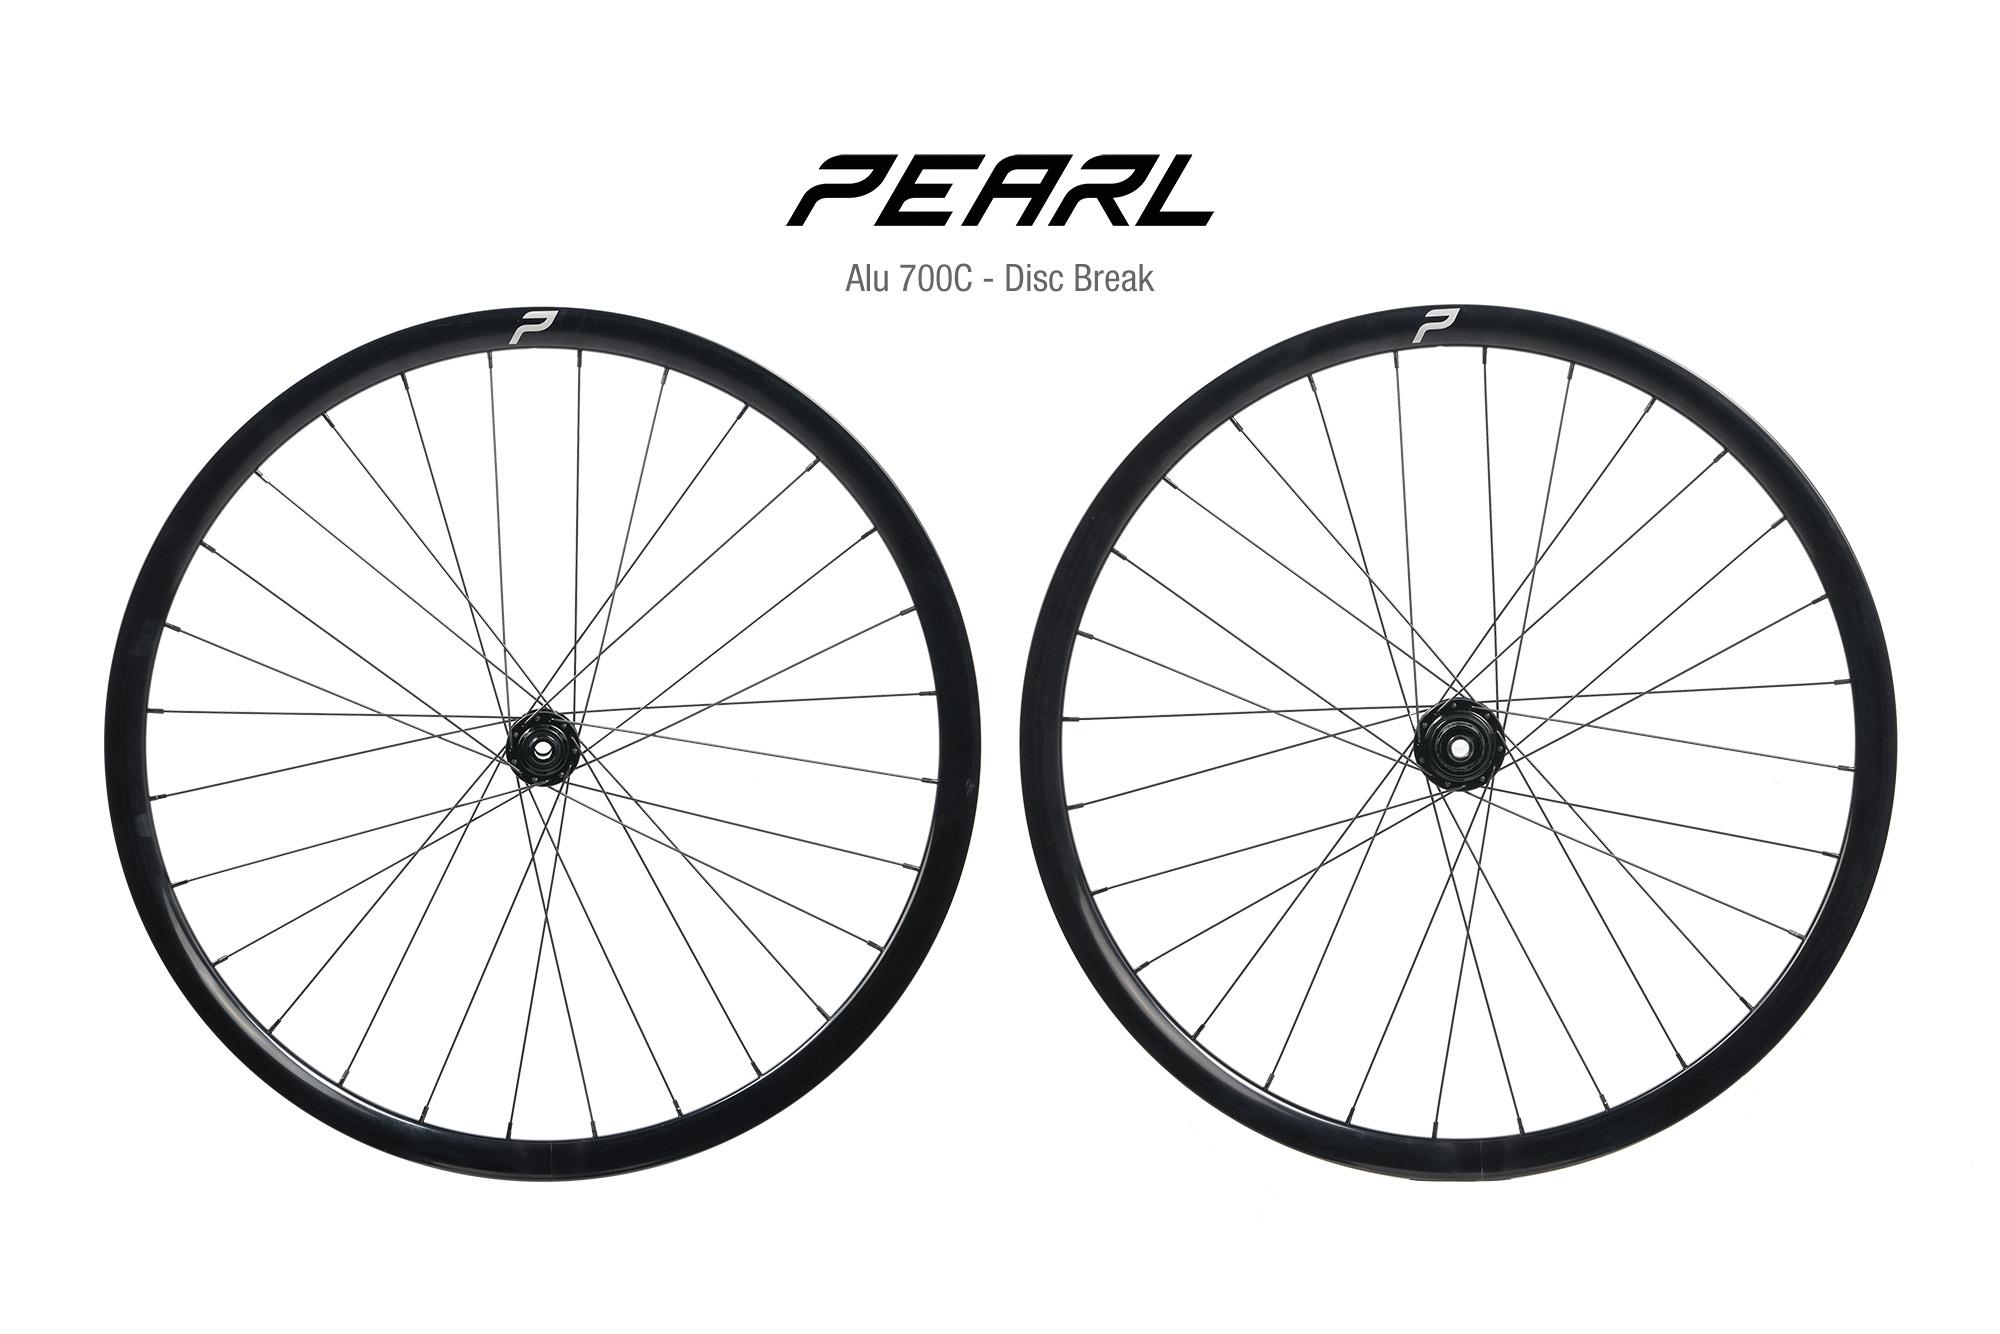 PEARL | Alloy Superlight Road Disc Wheelset